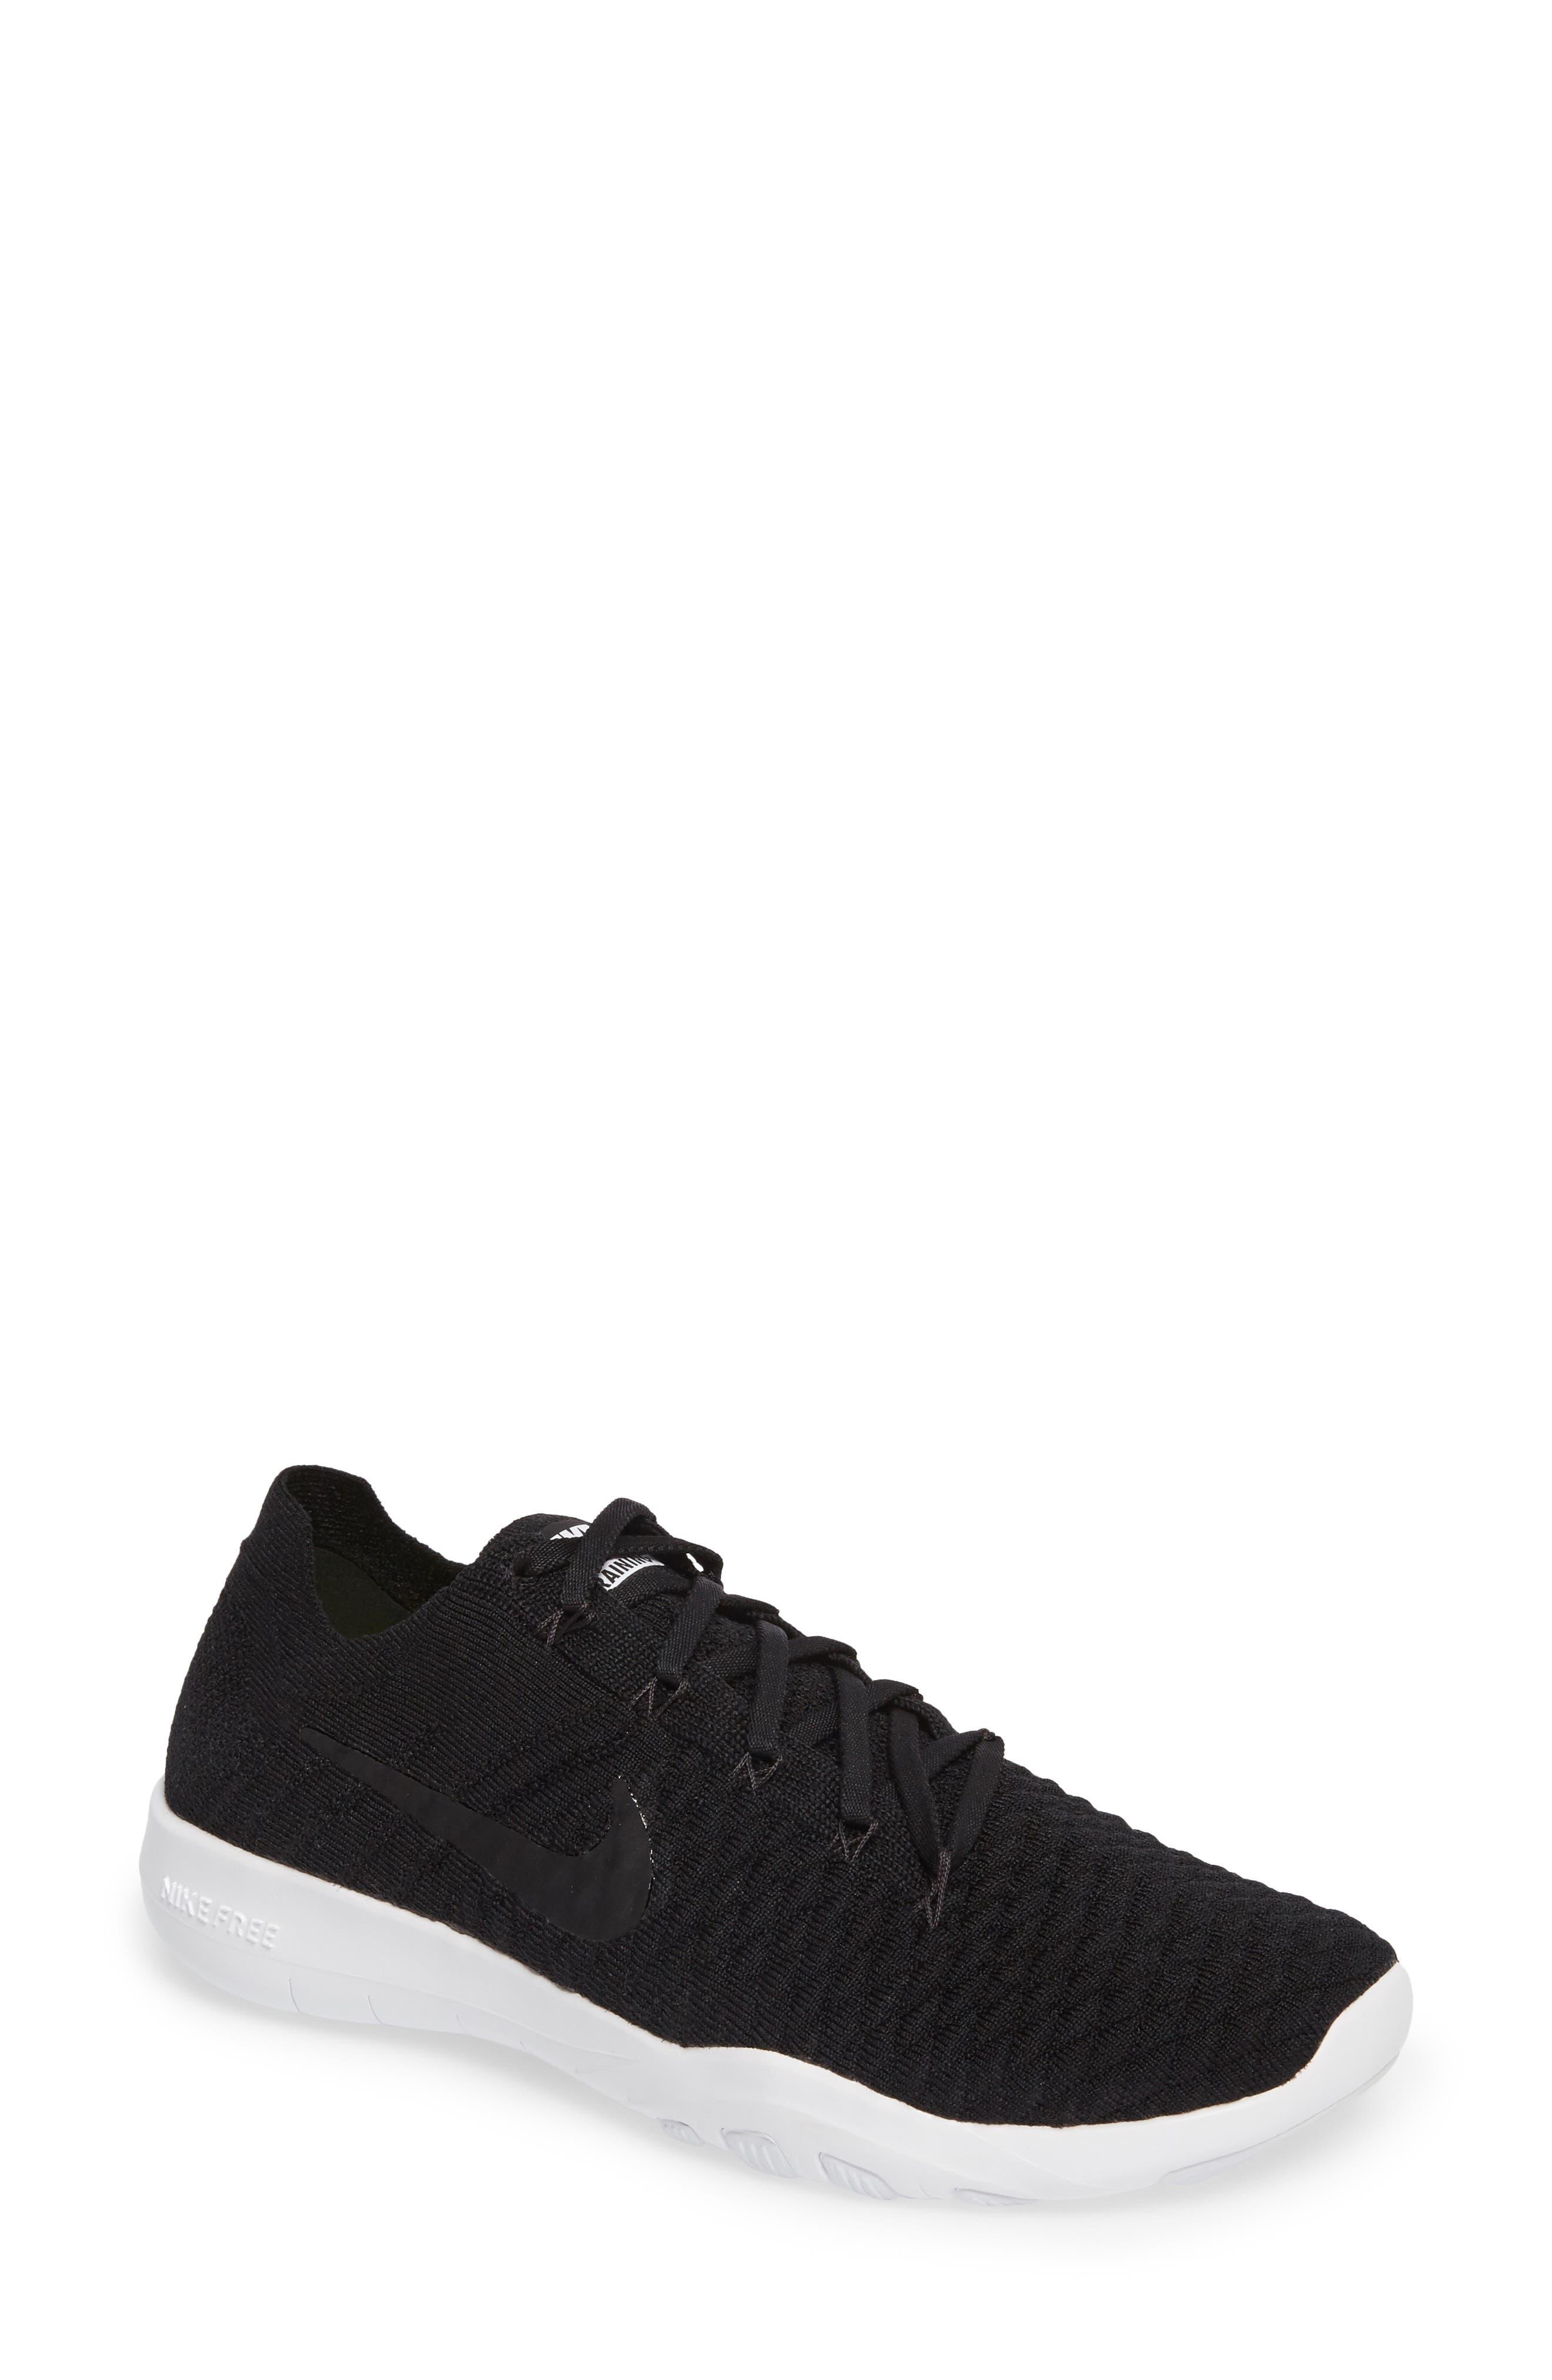 Free TR Flyknit 2 Training Shoe,                         Main,                         color, Black/ Black/ White